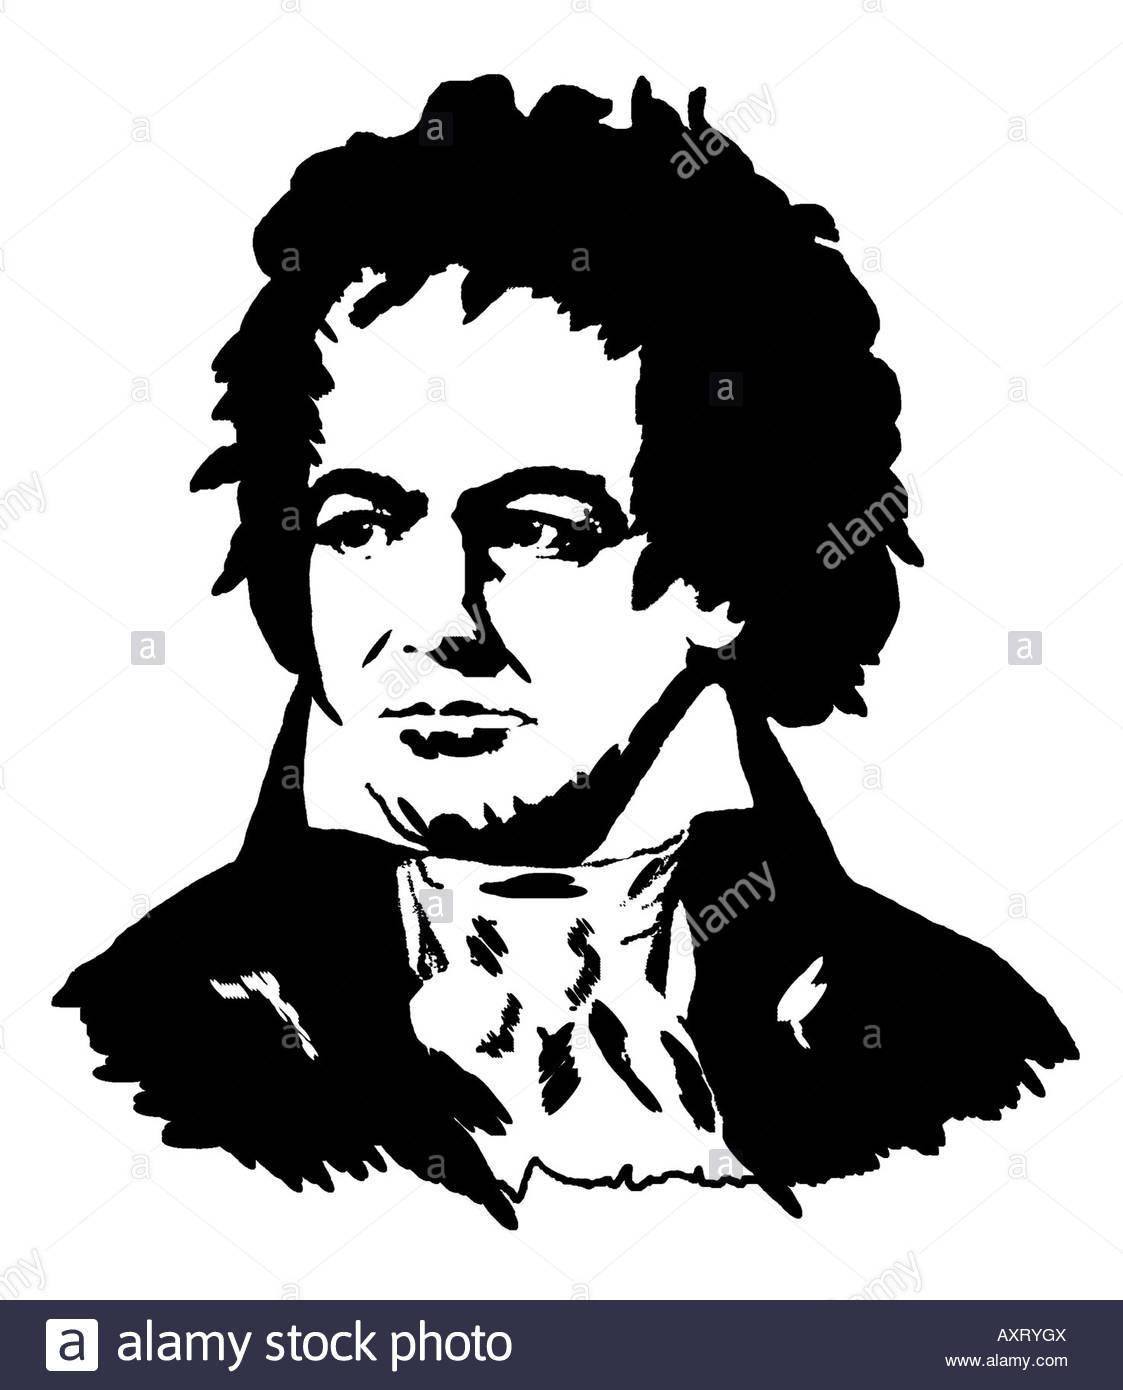 Ludwig van Beethoven 1770 1827 German Composer Poster Style Modern Illustration - Stock Image